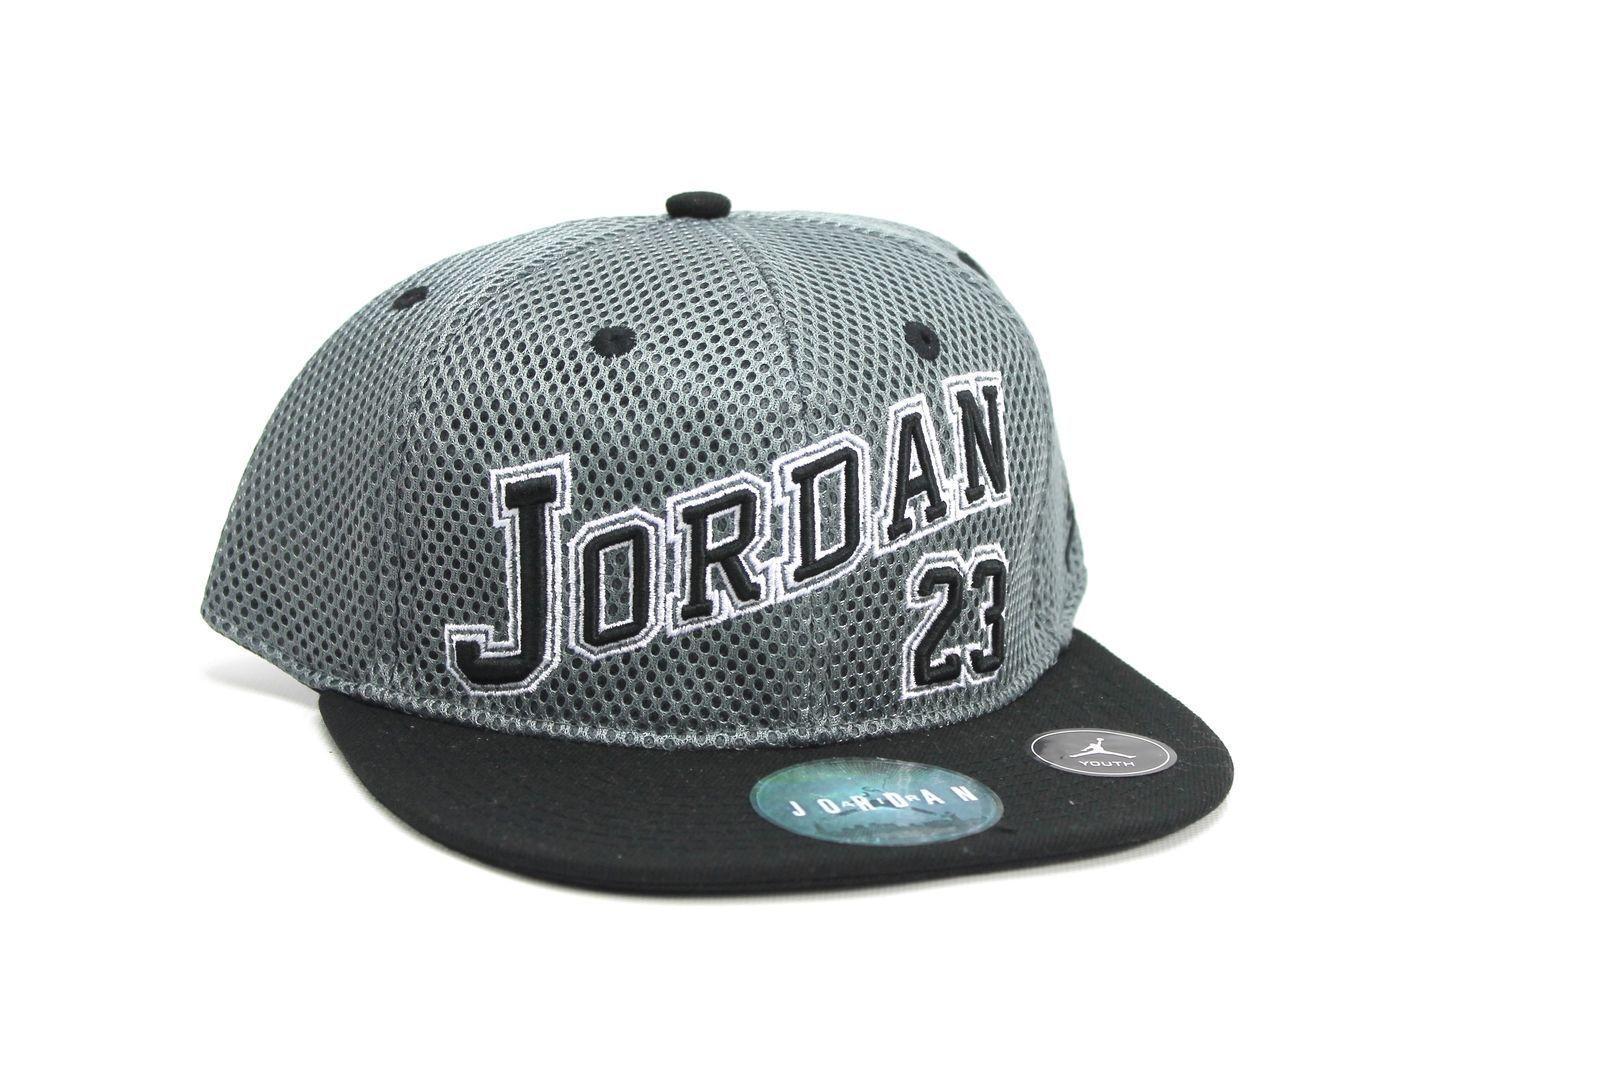 d1510b4ebf6863 Nike Jordan Varsity 23 Grey Black Kids Snapback Hat Cap 9a1683 146 ...